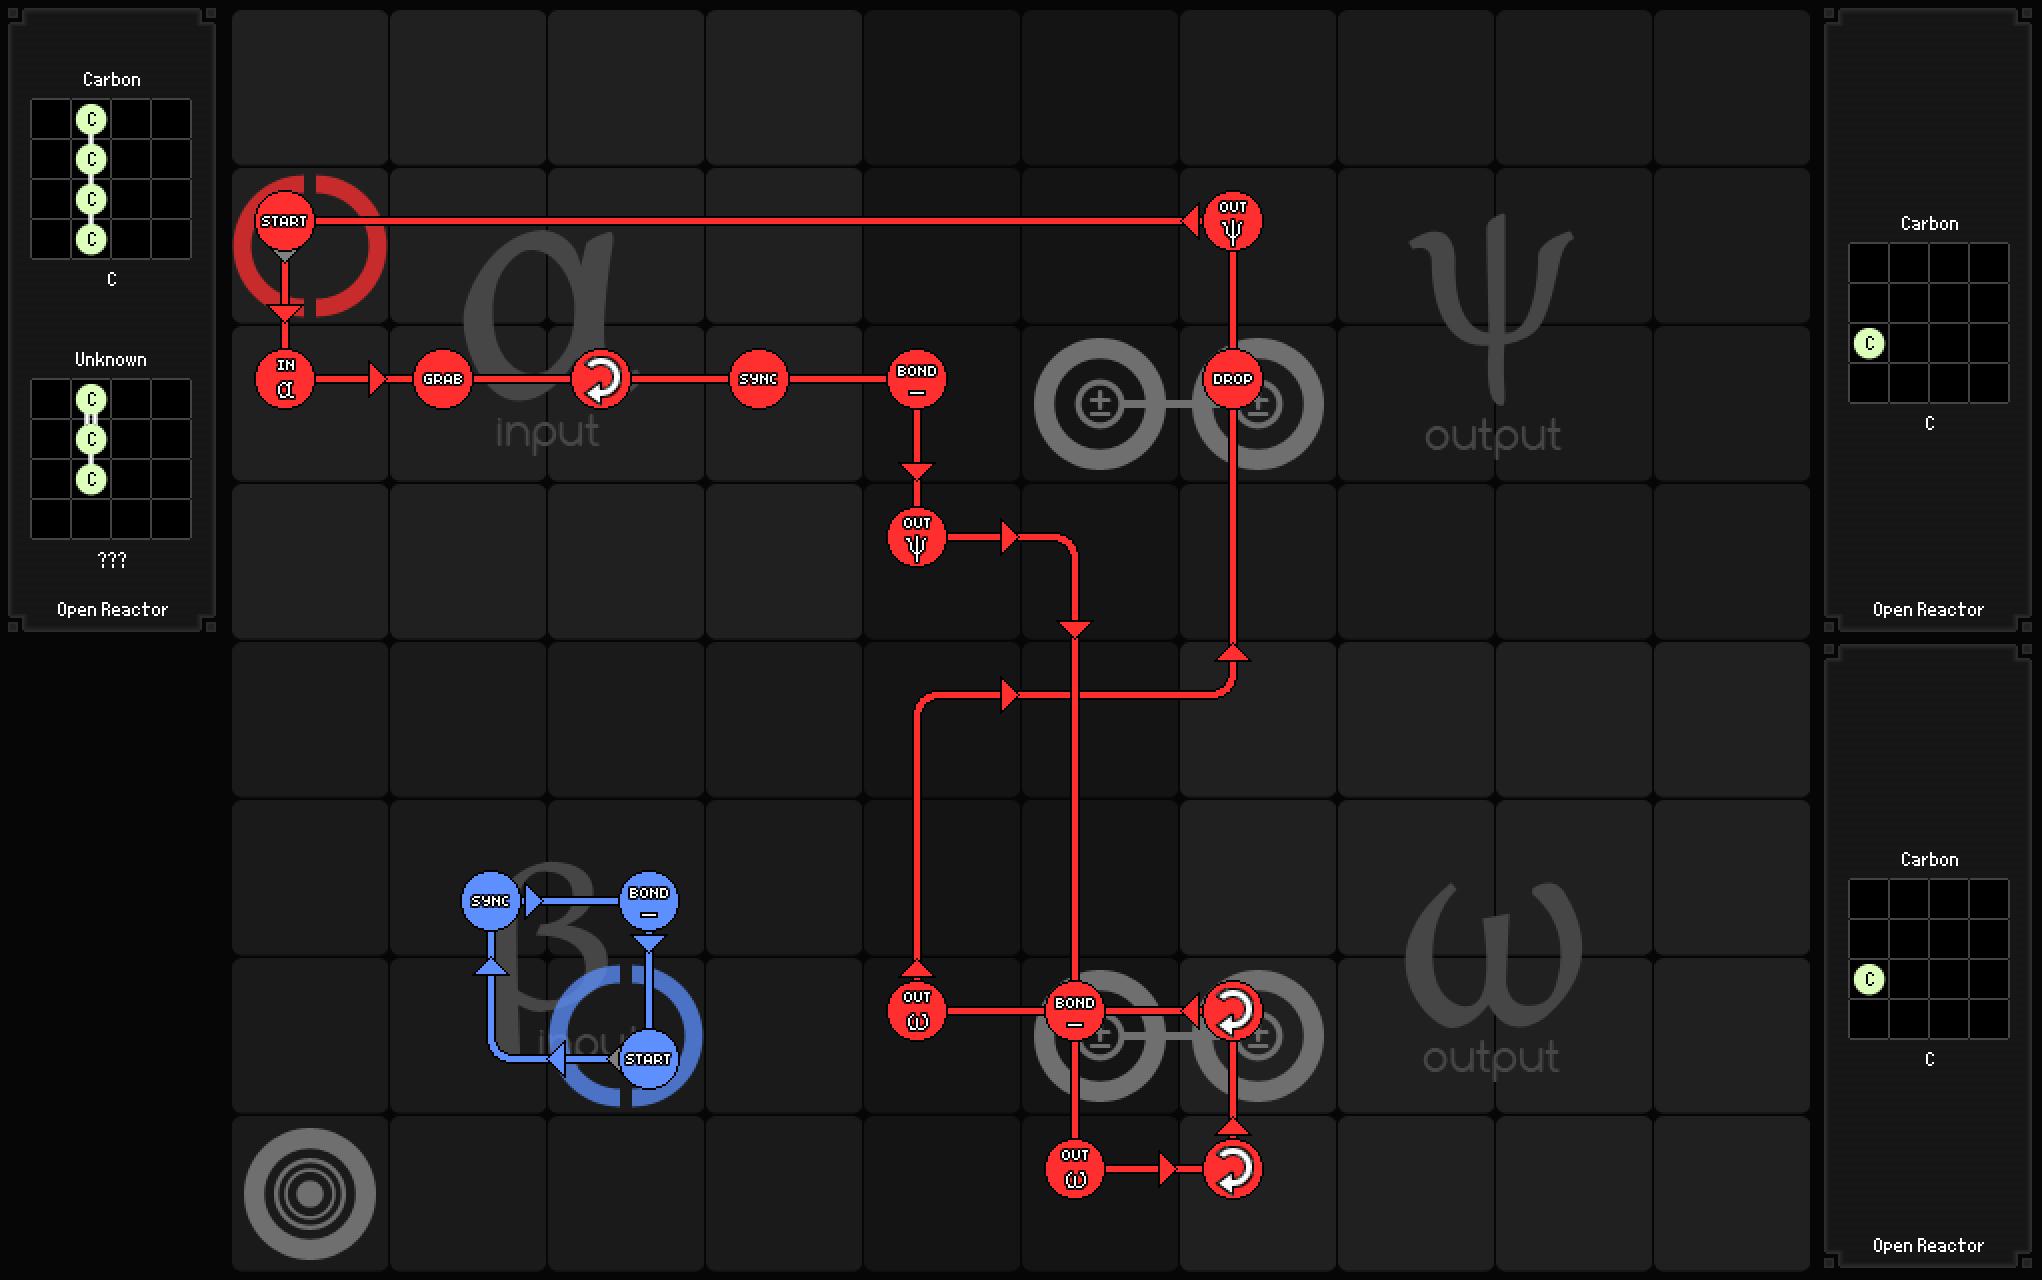 1_Story_Mode/6_Hephaestus_IV/SpaceChem-6.6.a/Reactor_3.png